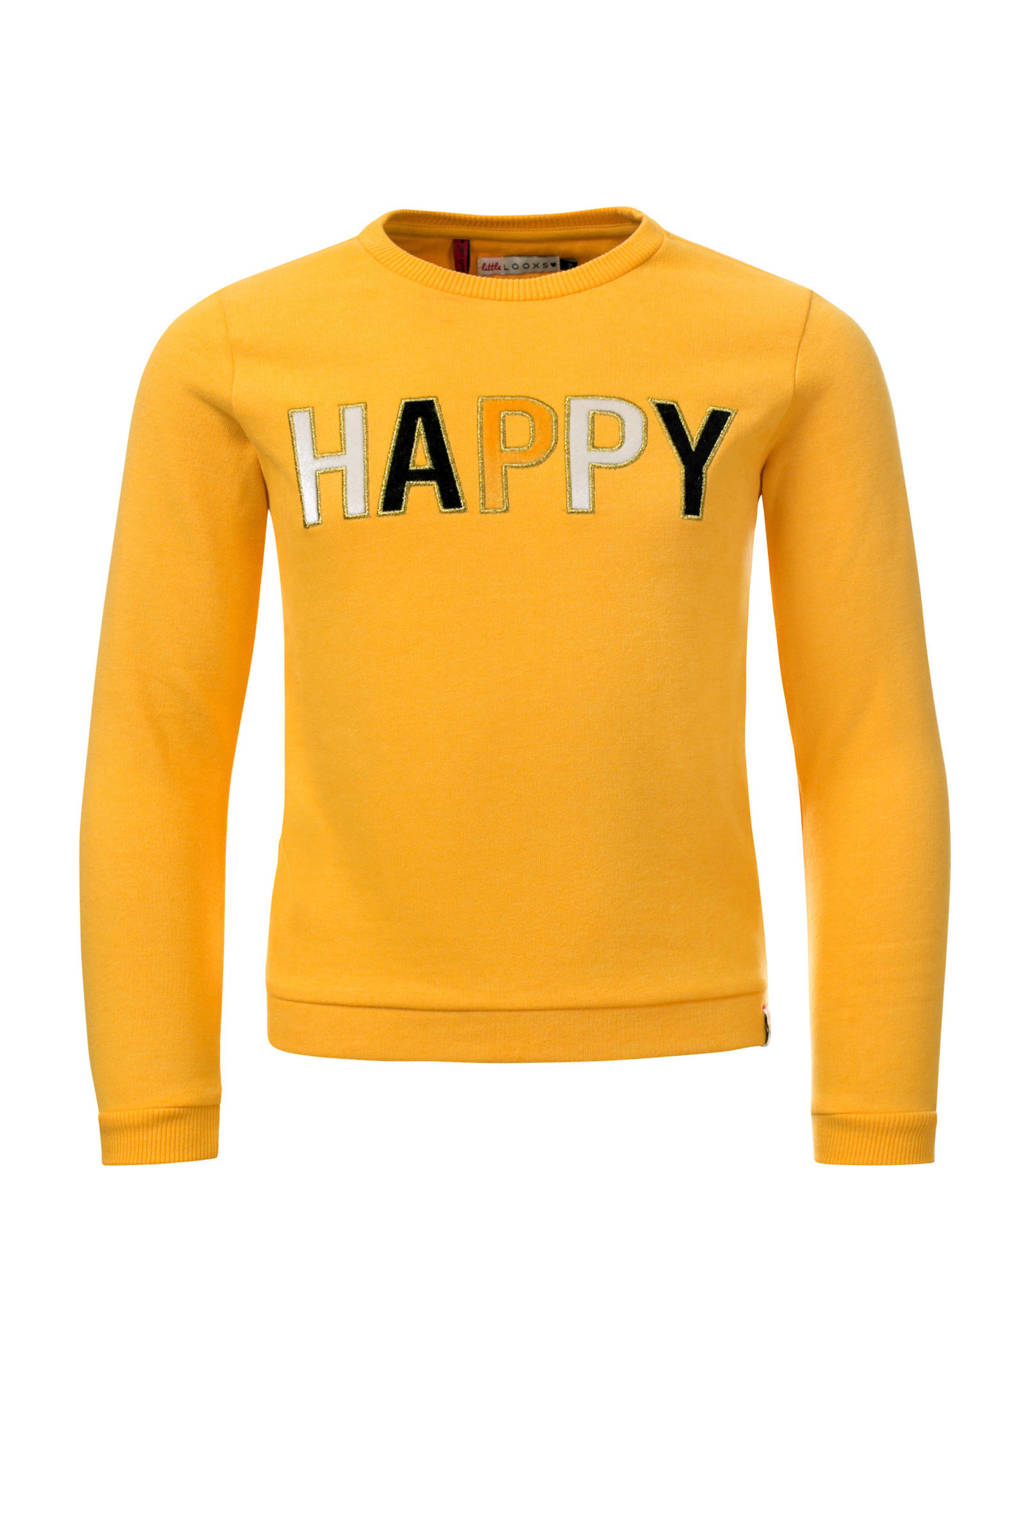 LOOXS Little sweater met tekst geel, Geel